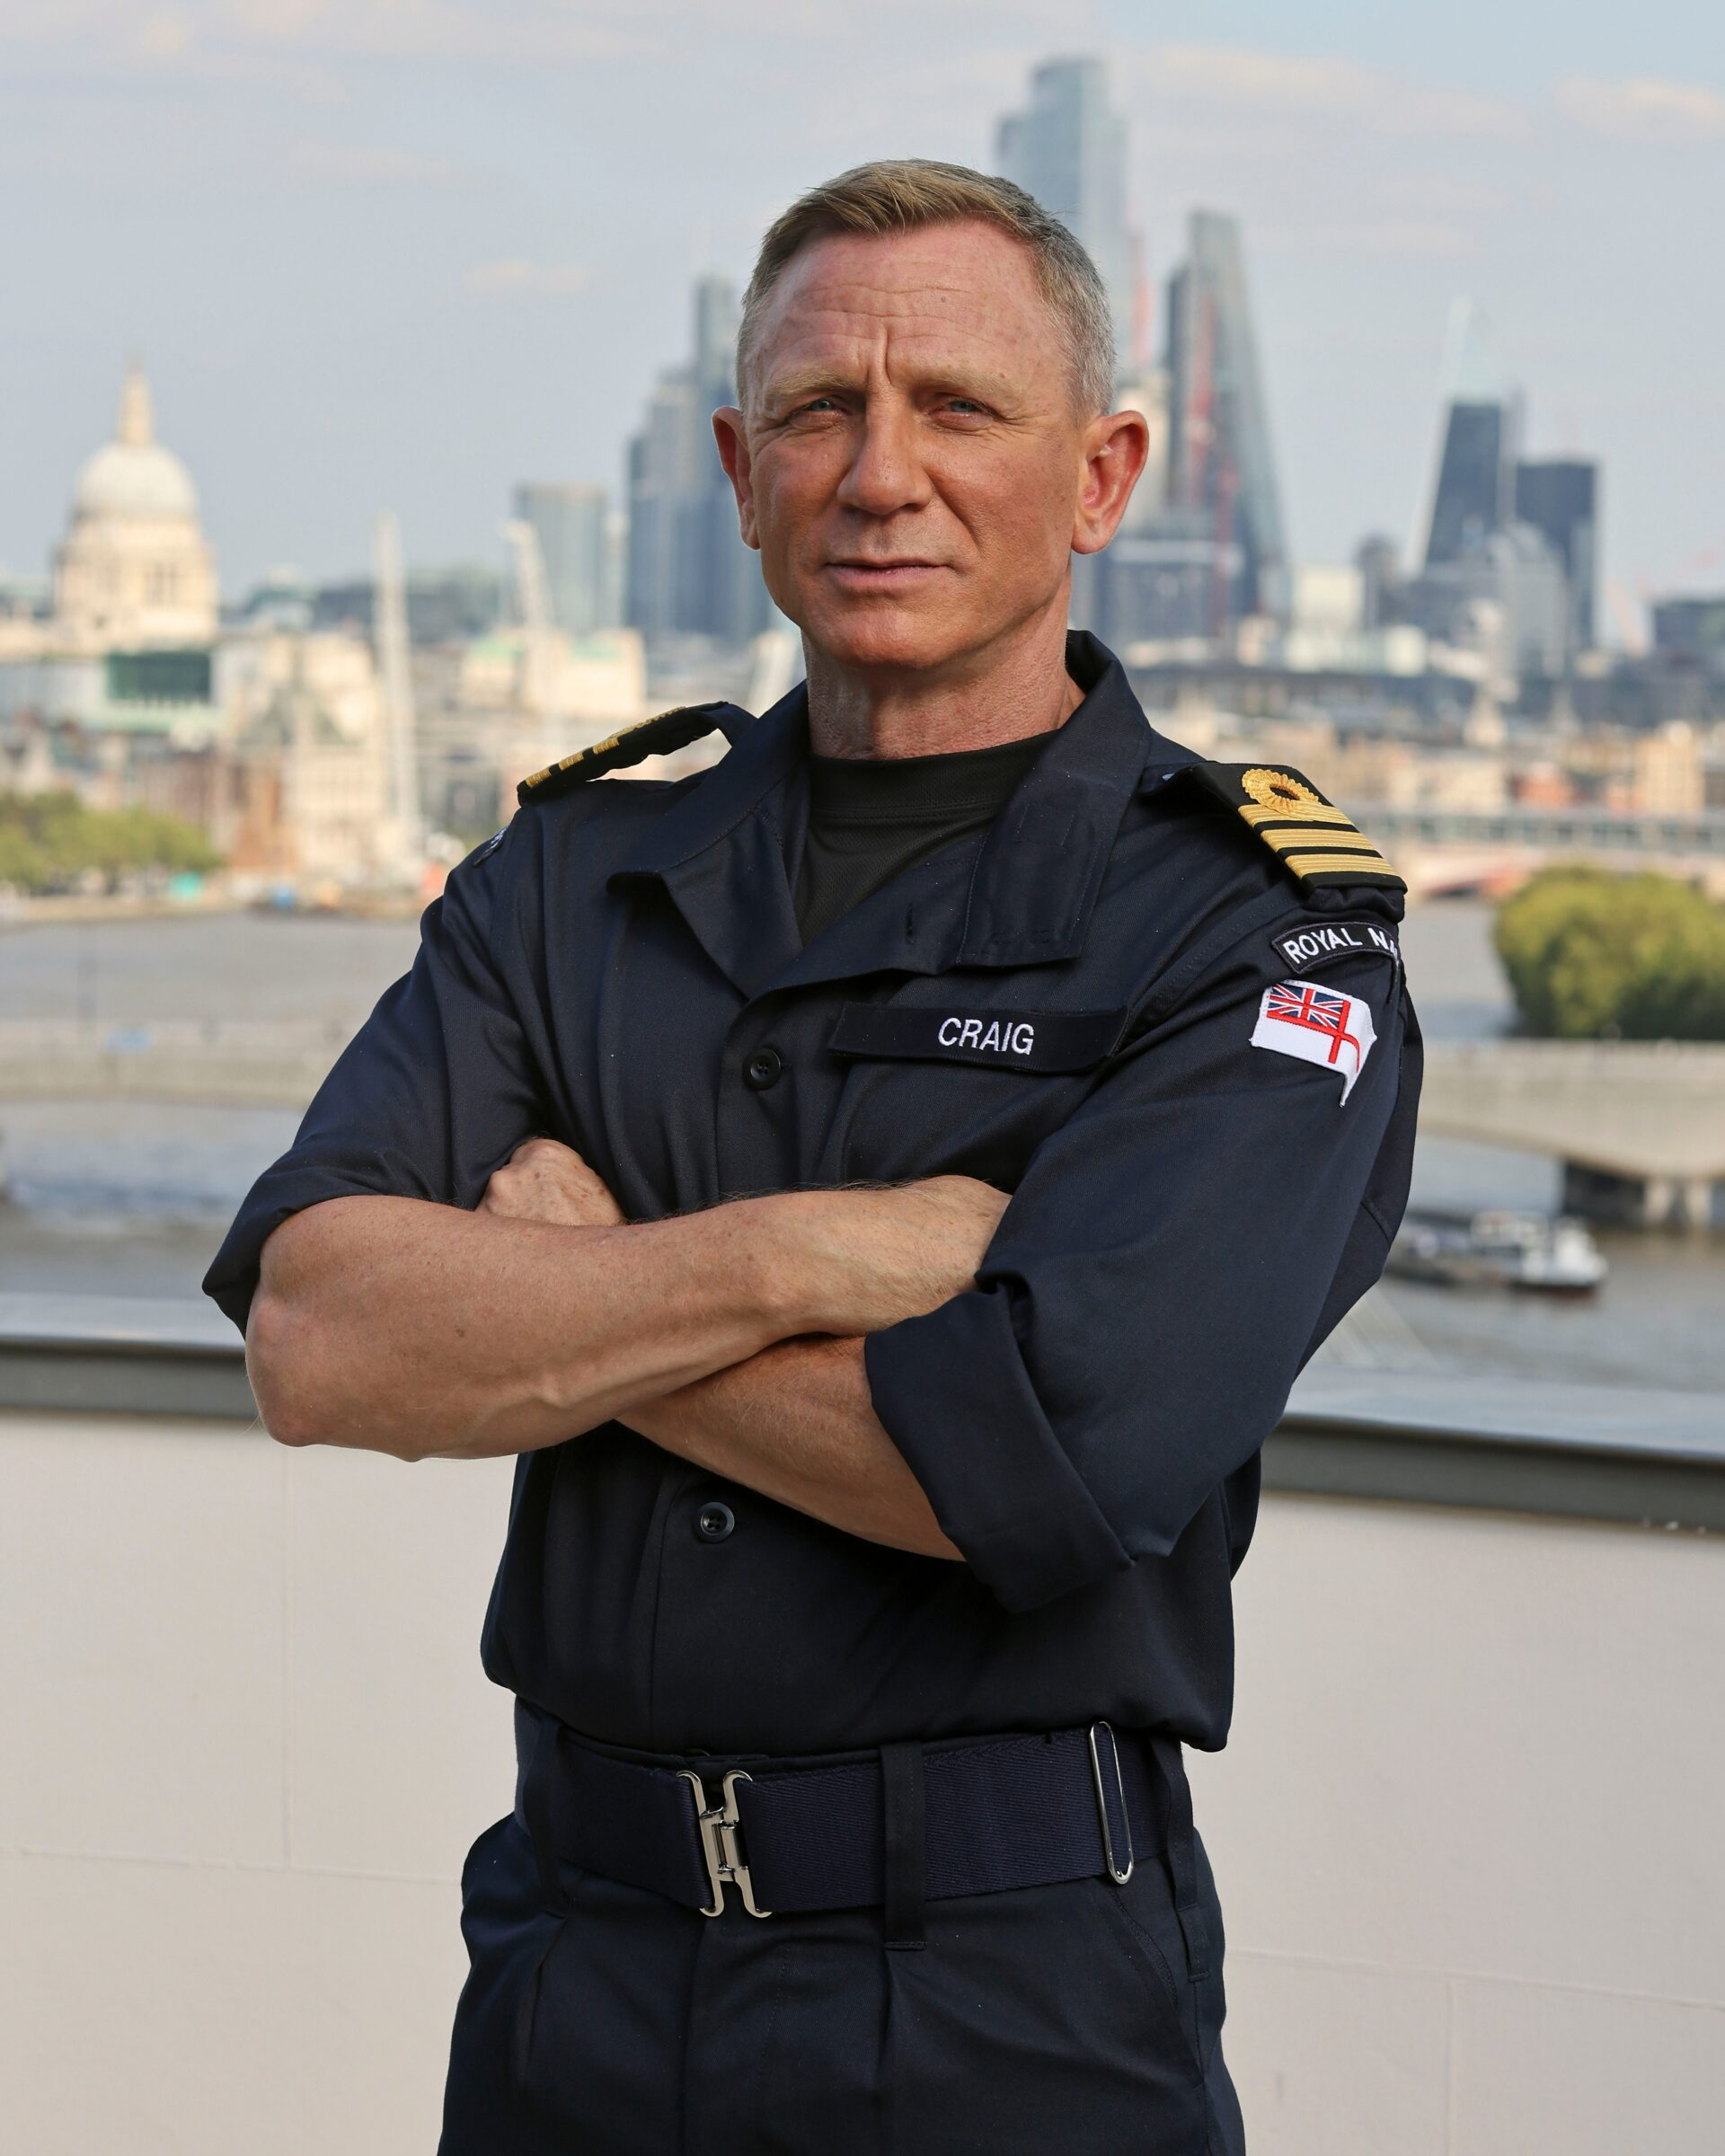 On Her Majesty's Naval Service: Craig awarded Bond's RN rank